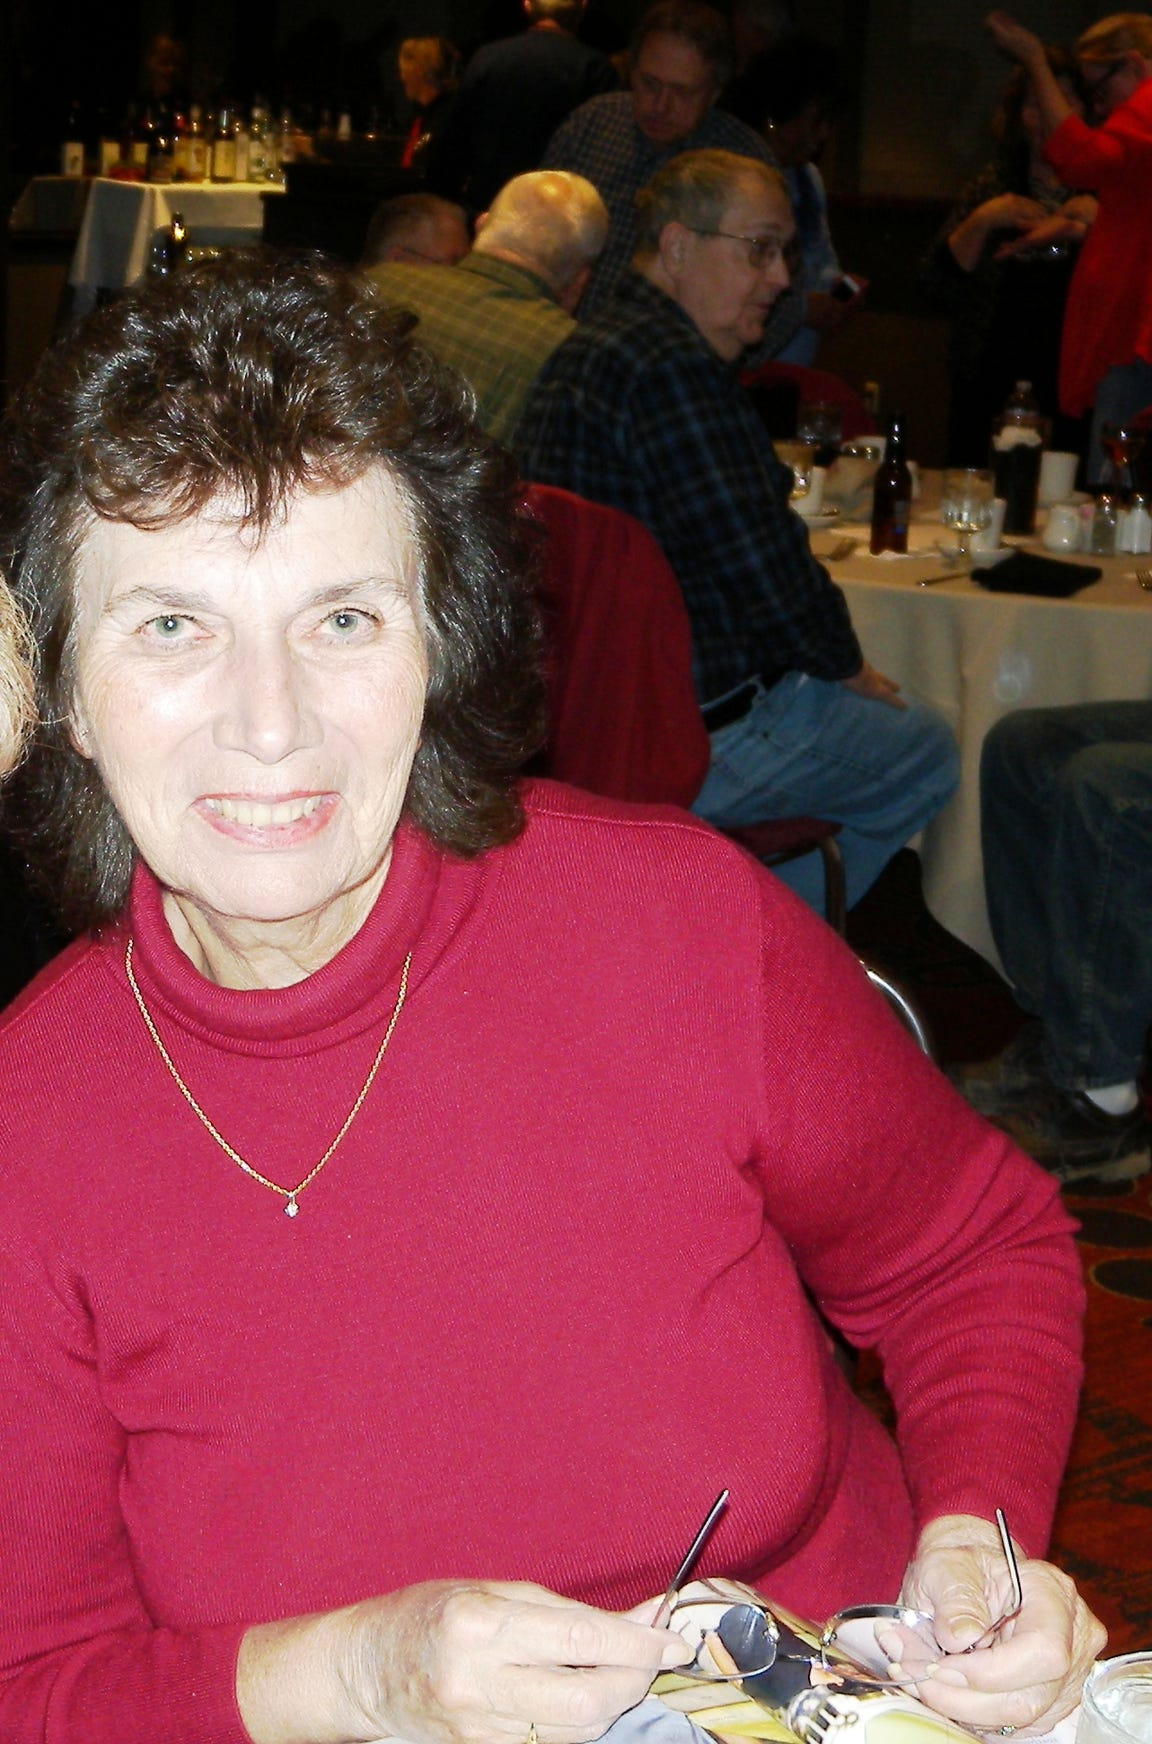 Sophia Renken of Gardnerville